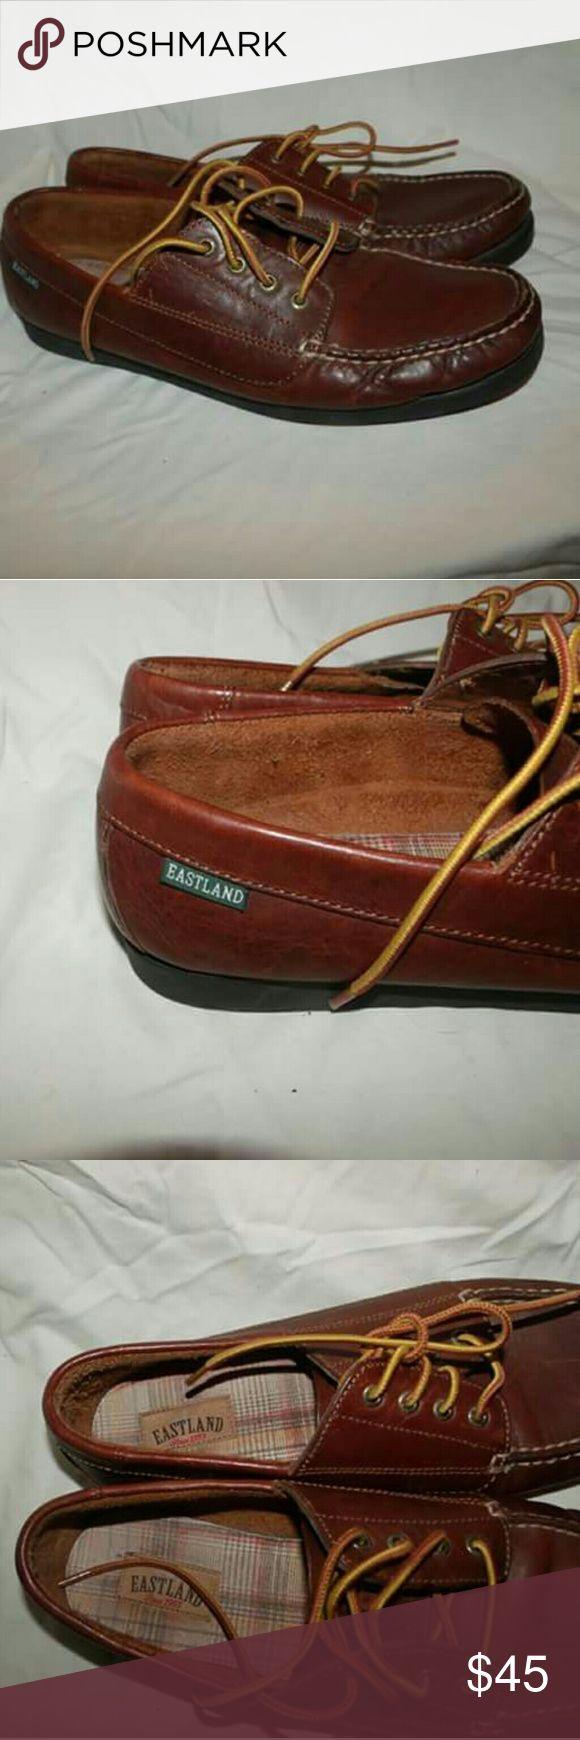 "Eastland ""Falmouth"" size 11 Leather Boat Shoe New without box ladies Eastland "" Falmouth"" brown leather boat shoe Eastland Shoes Flats & Loafers"